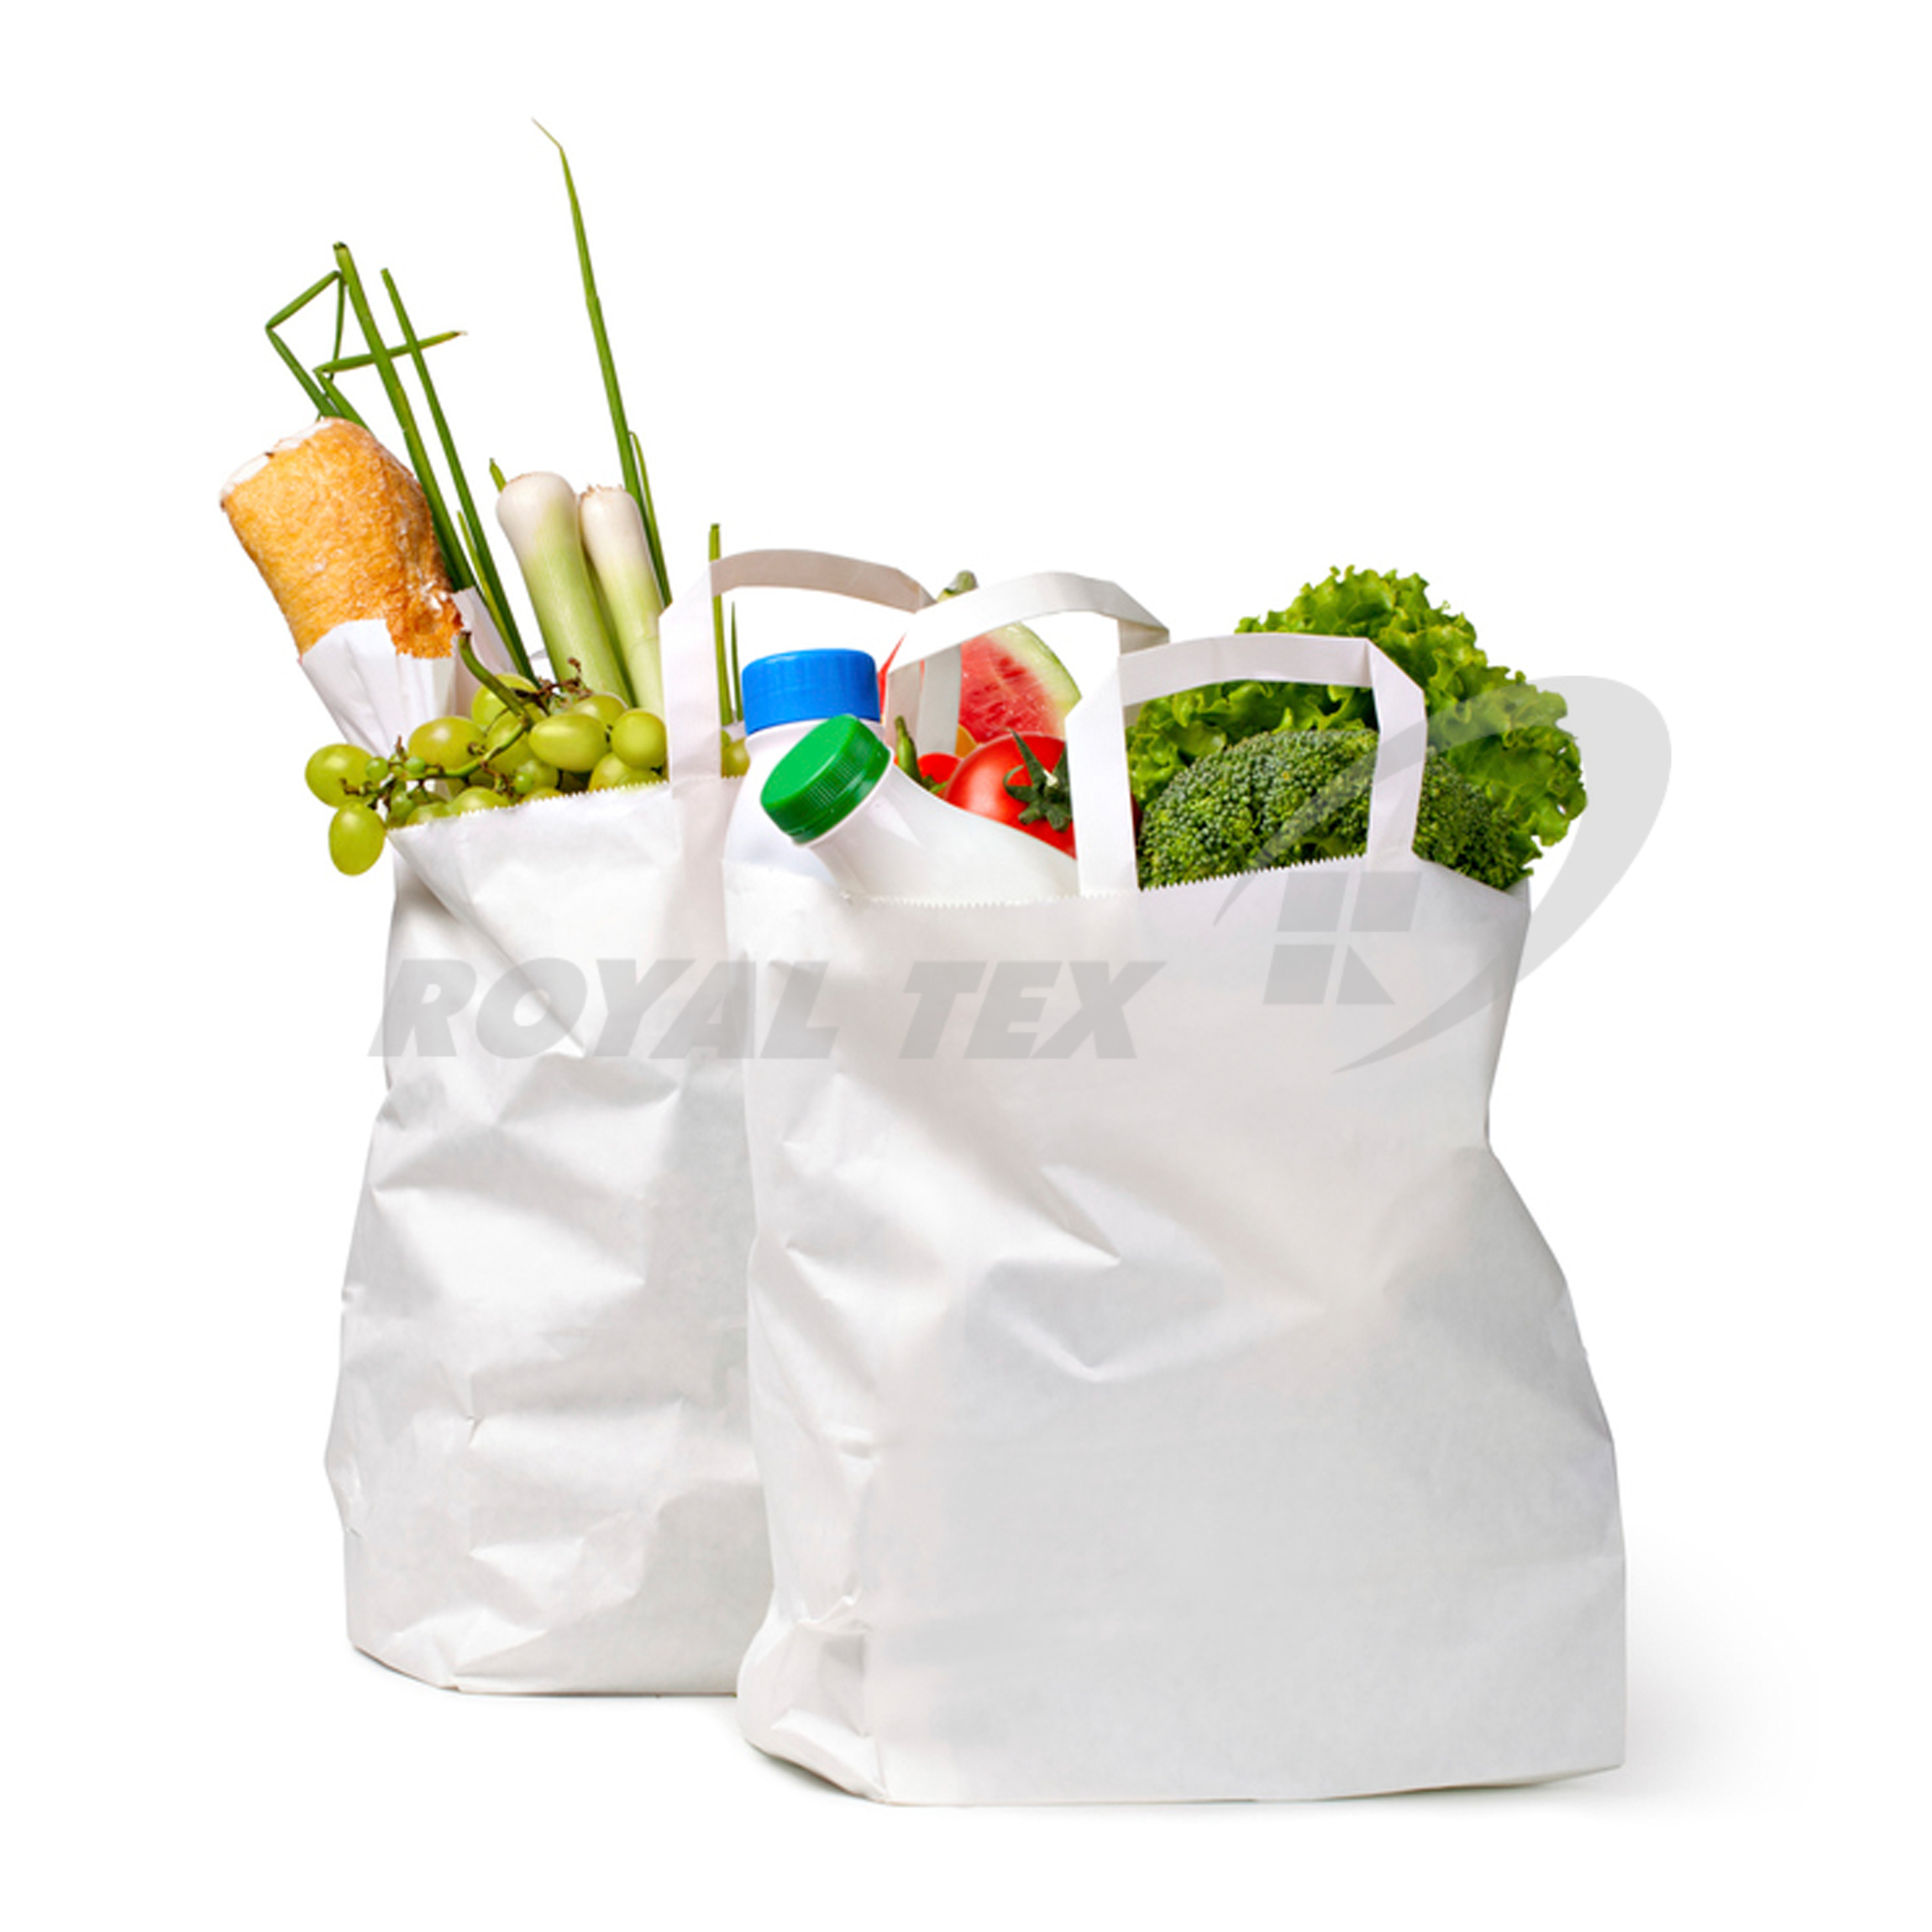 Tote Bag / Shopping Bag - 1